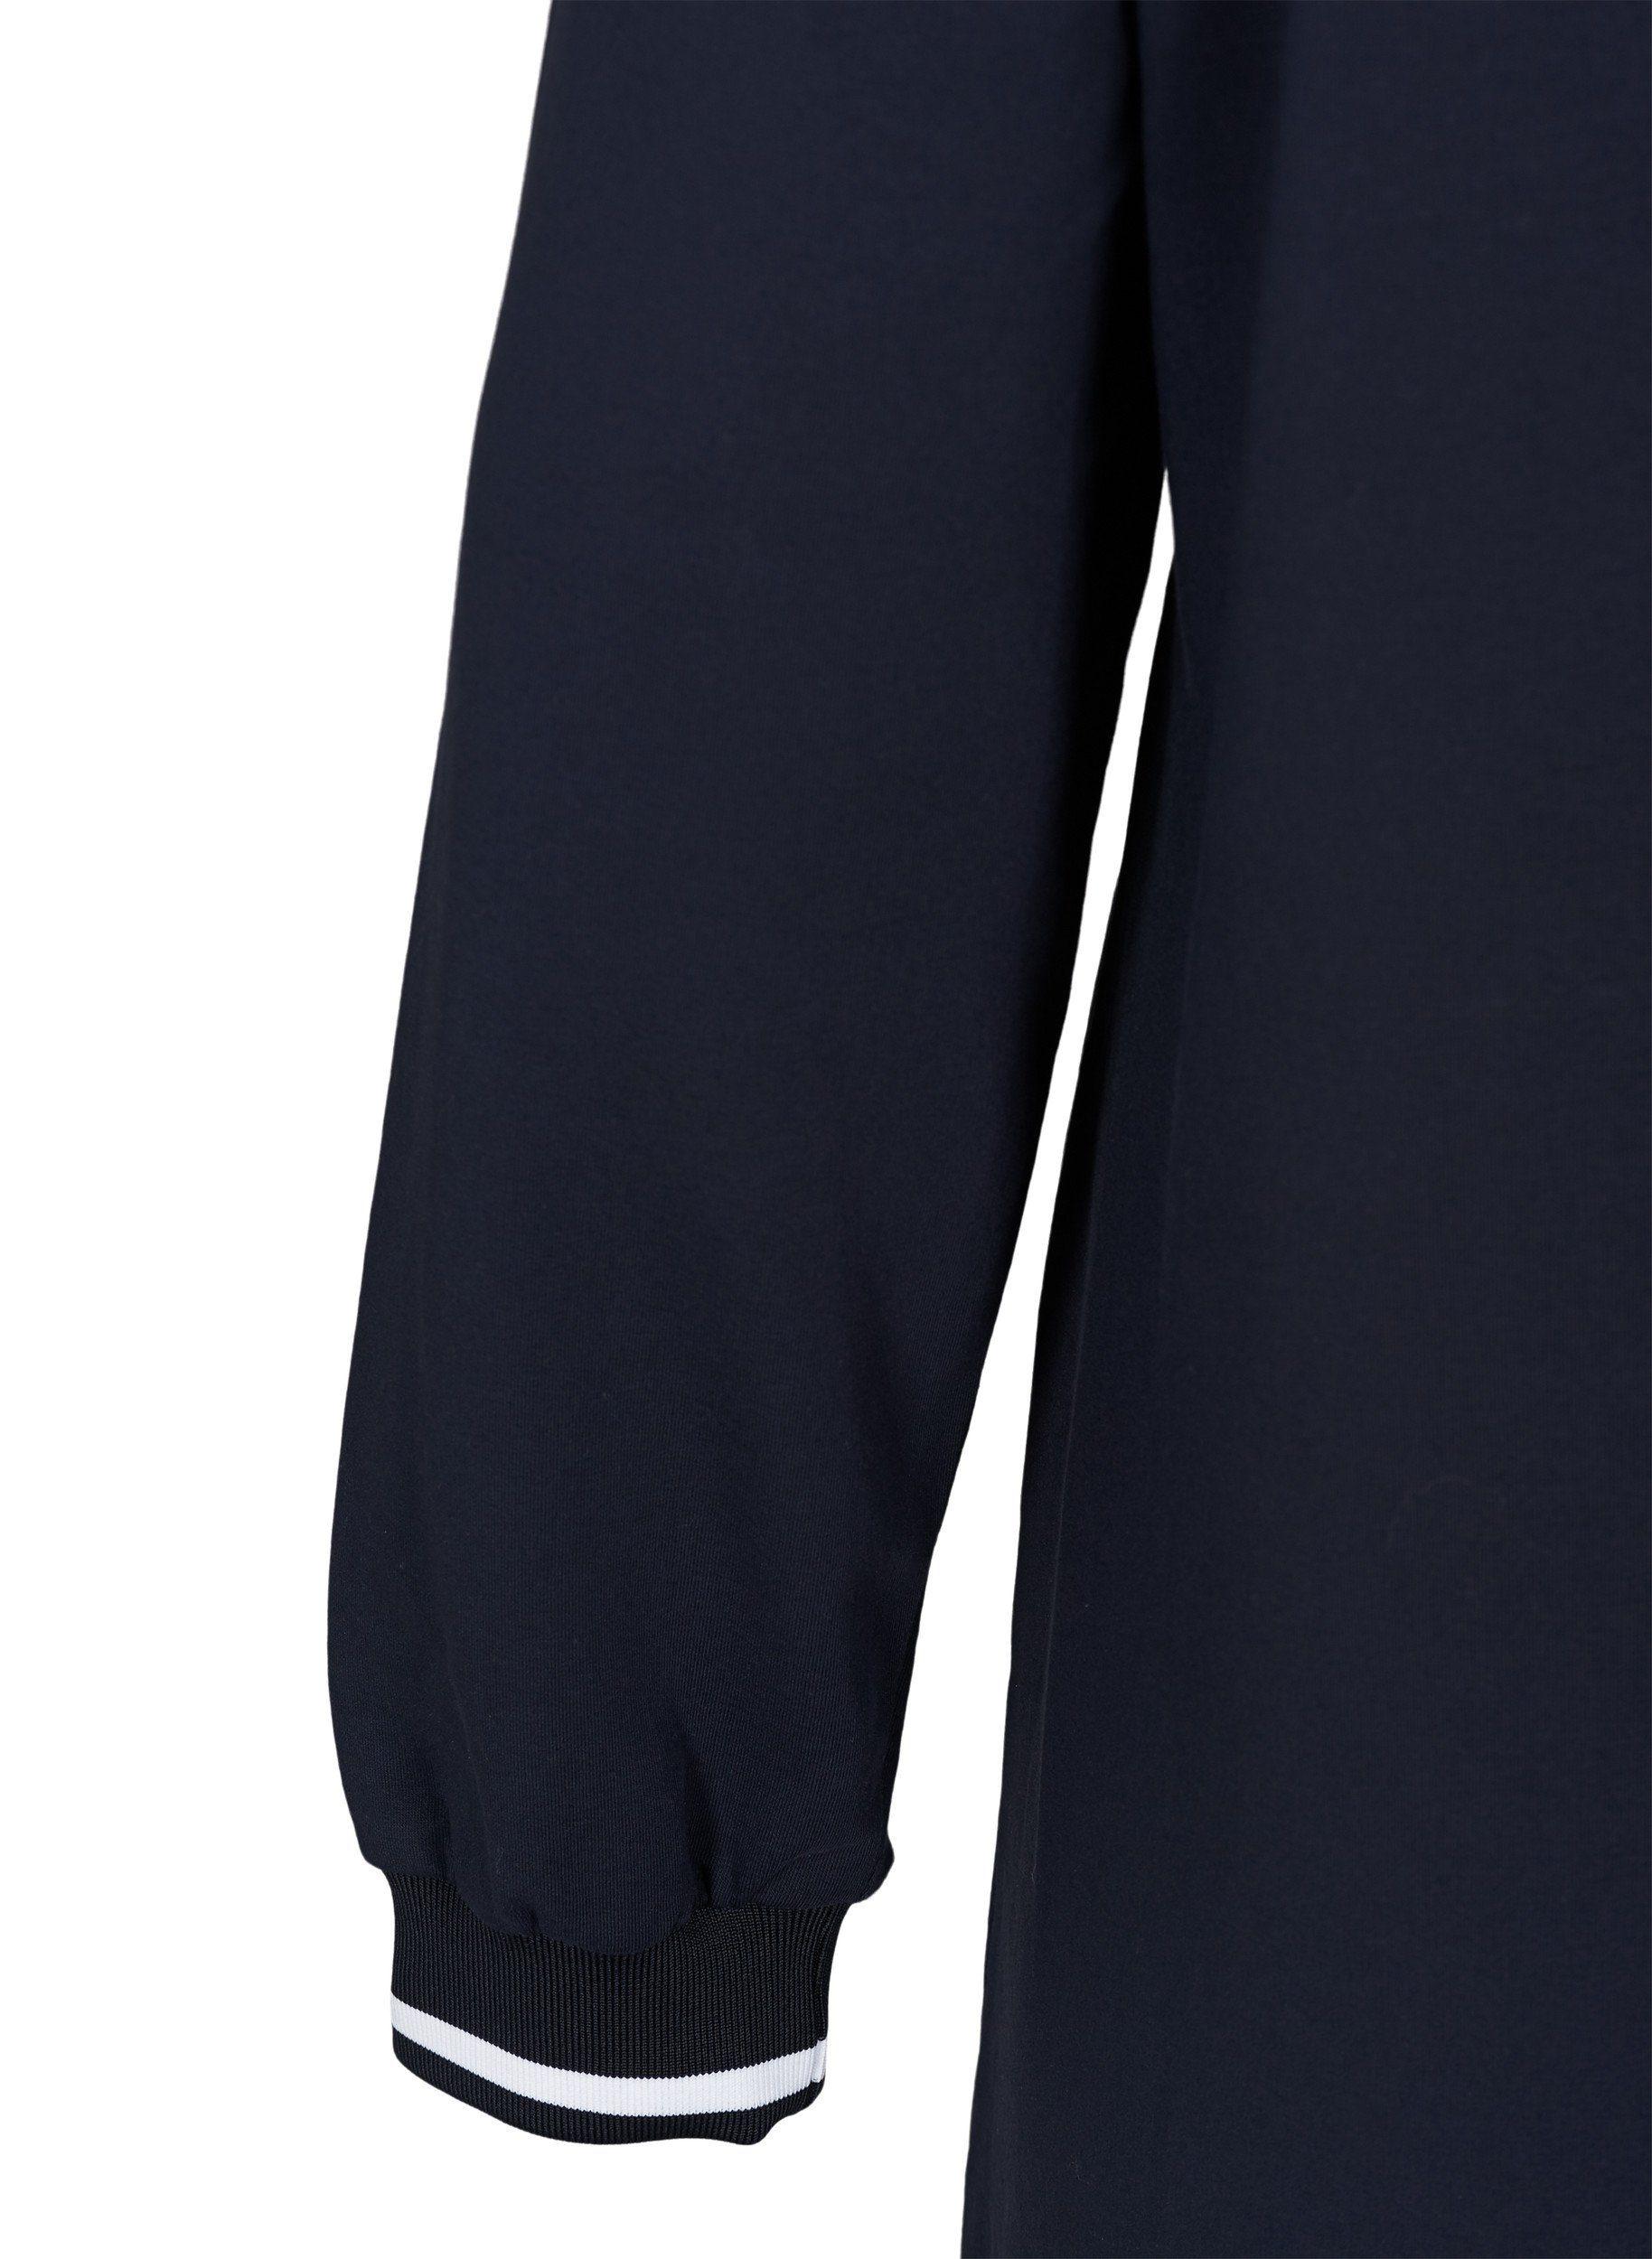 Zizzi Longtunika Damen Elegant Tunika 3/4 Arm Longbluse V-Ausschnitt Große Größen online kaufen 7Yab92